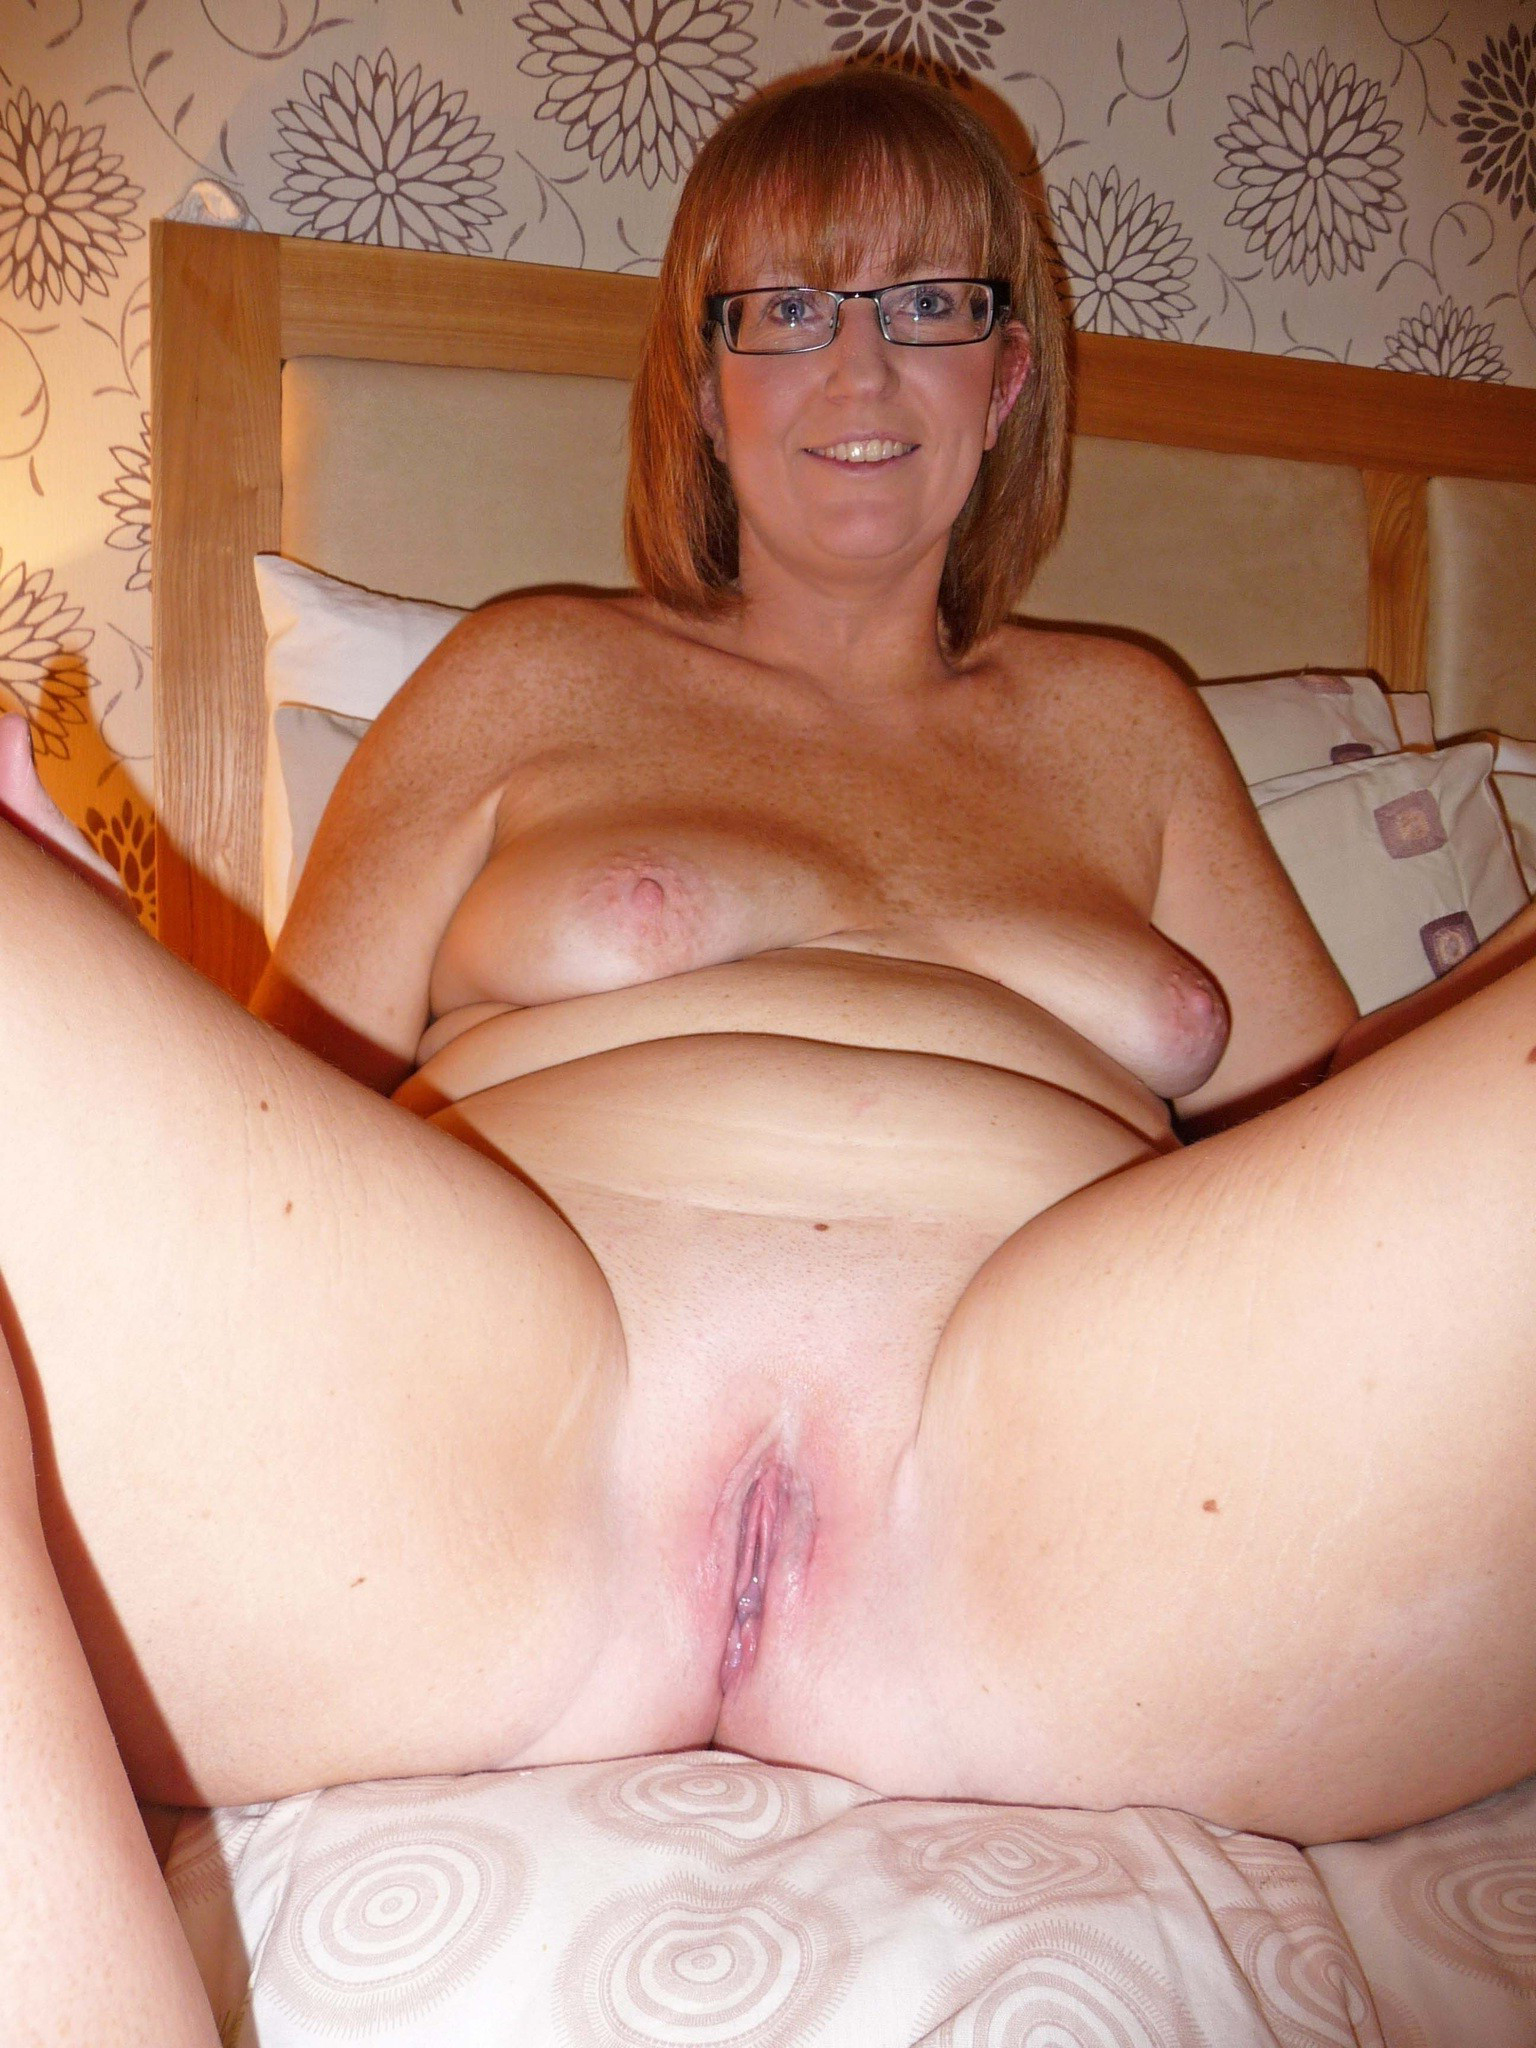 Big pussy pics